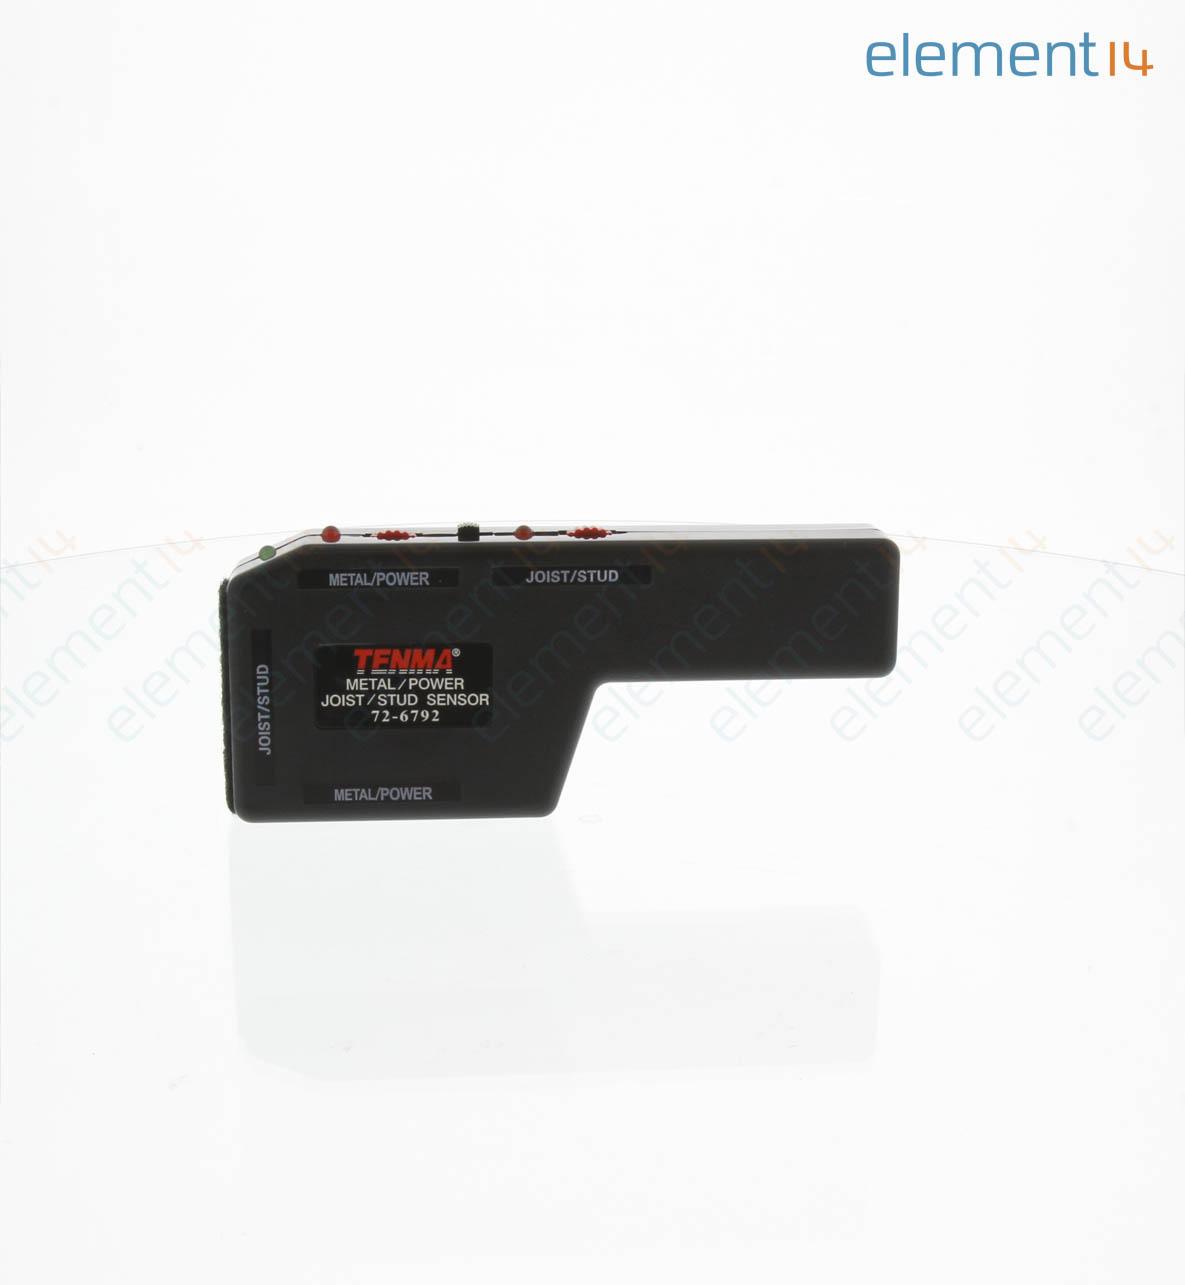 72-6792 tenma - detektor, metall, stromleitung   farnell de